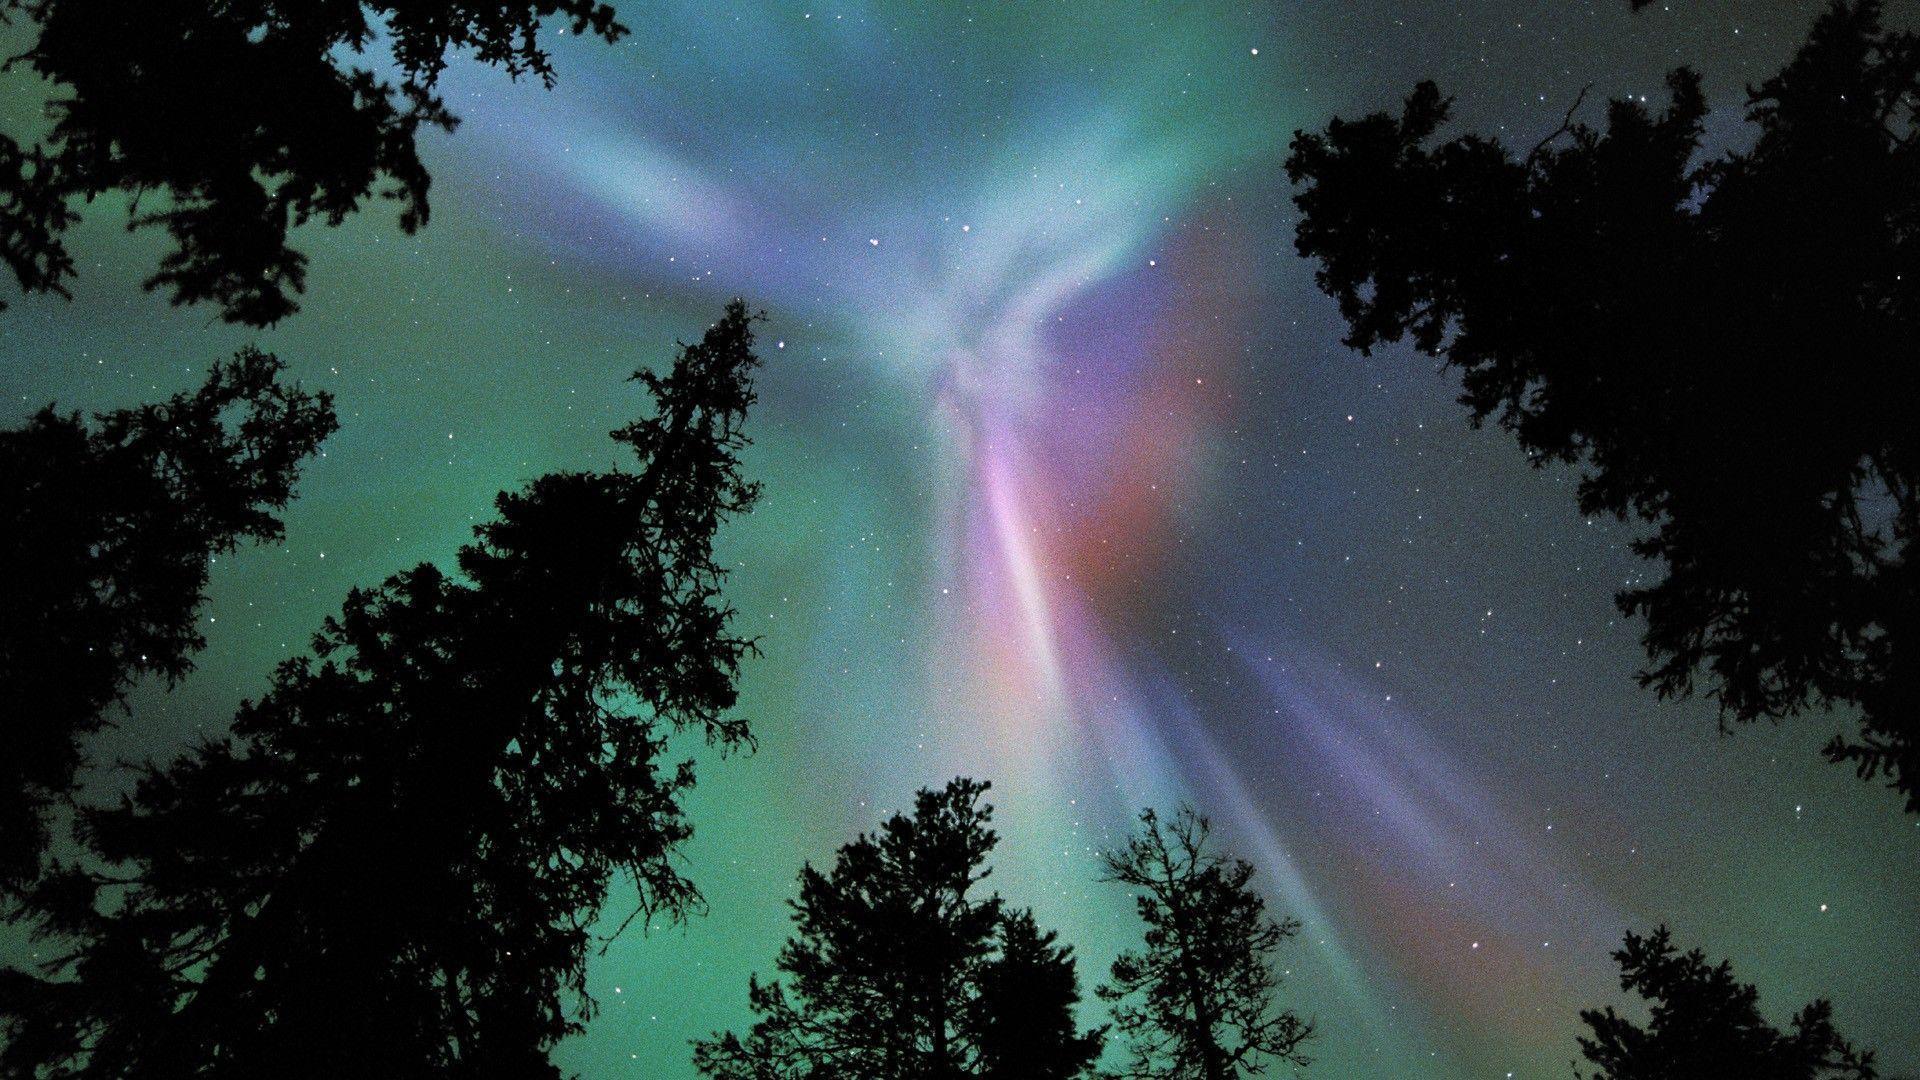 Search Q Aurora Borealis Wallpaper Widescreen Form Restab